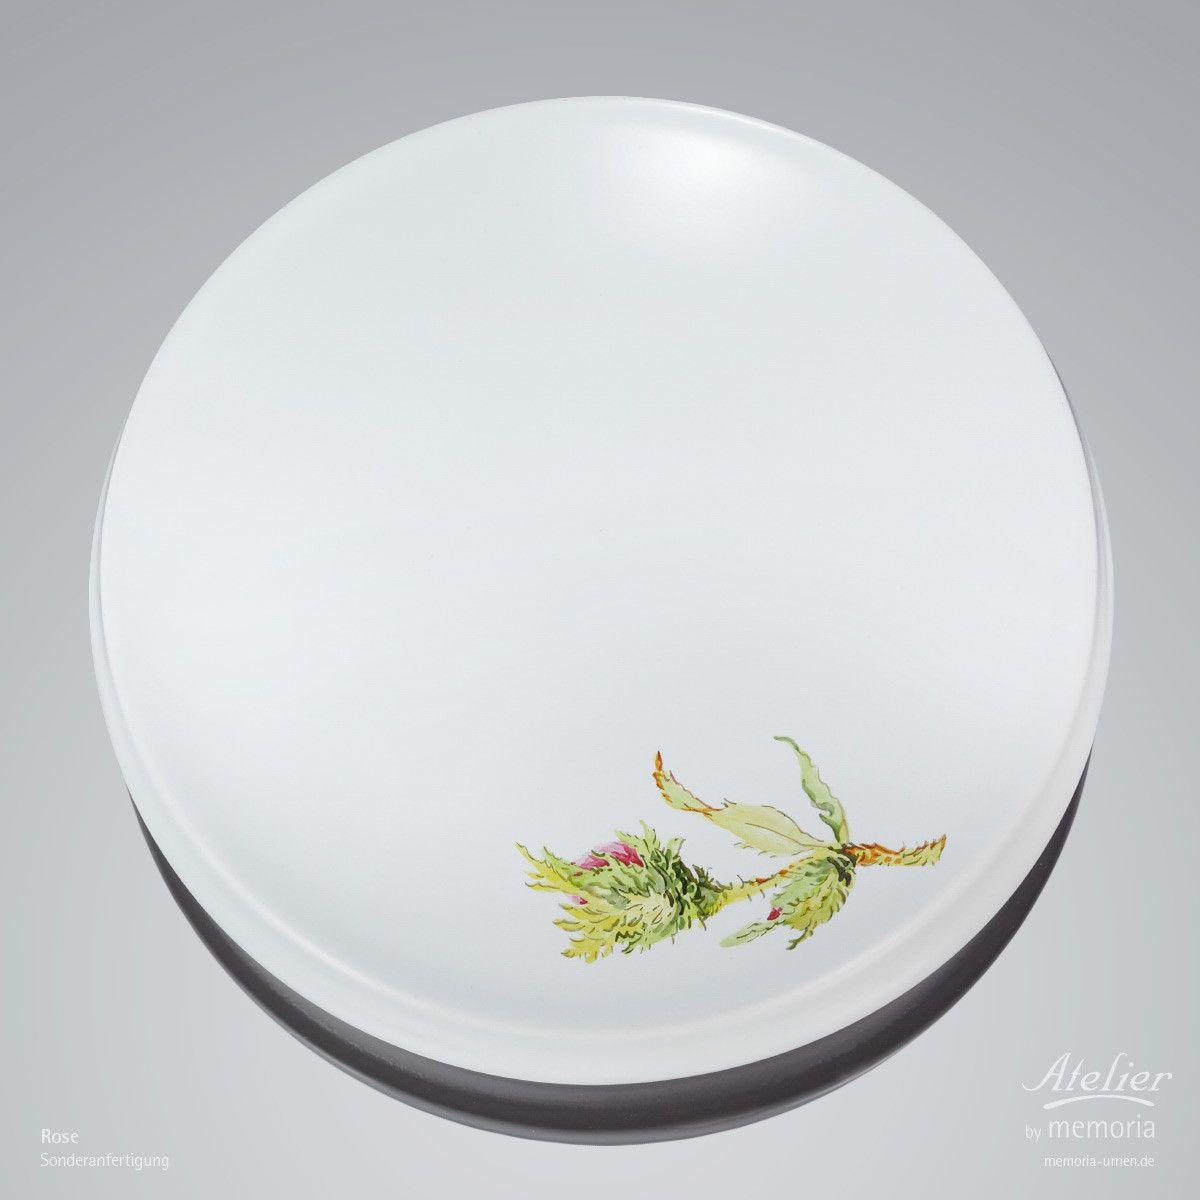 Urnen Individuell gestaltet | Sonderanfertigung Porzellan Porzellan